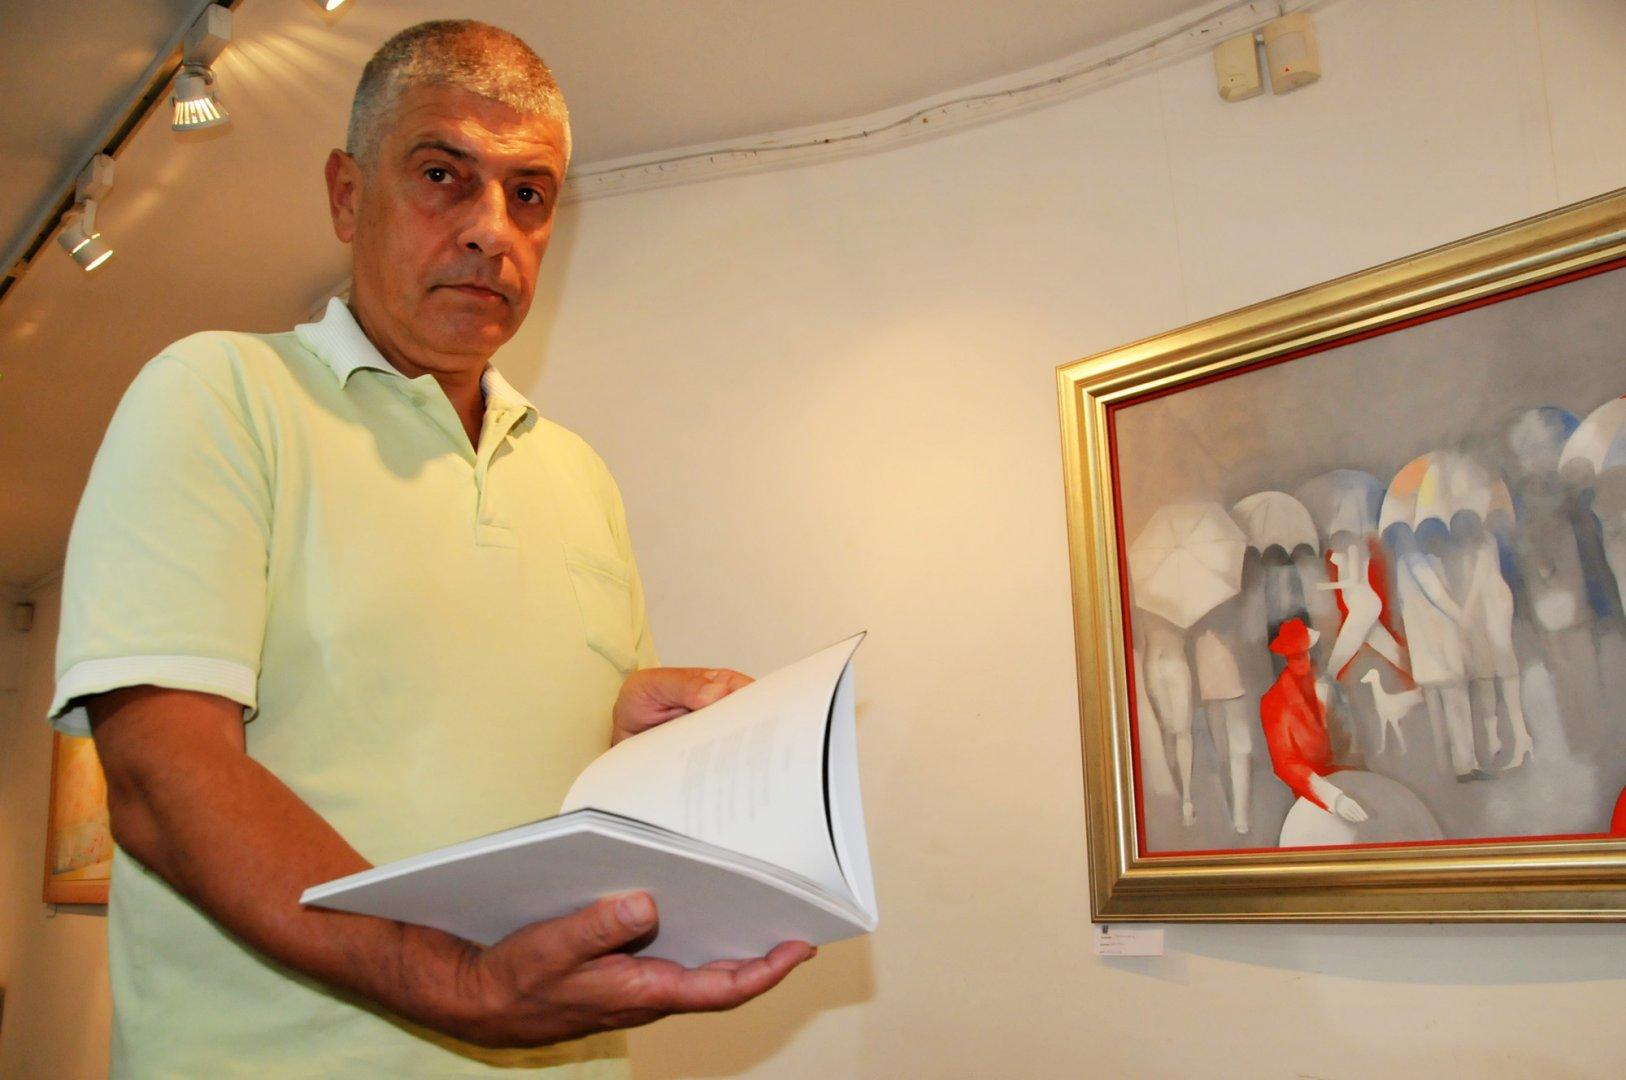 Художникът Владимир Пенев ще гостува в галерия Бургас. Снимка Лина Главинова